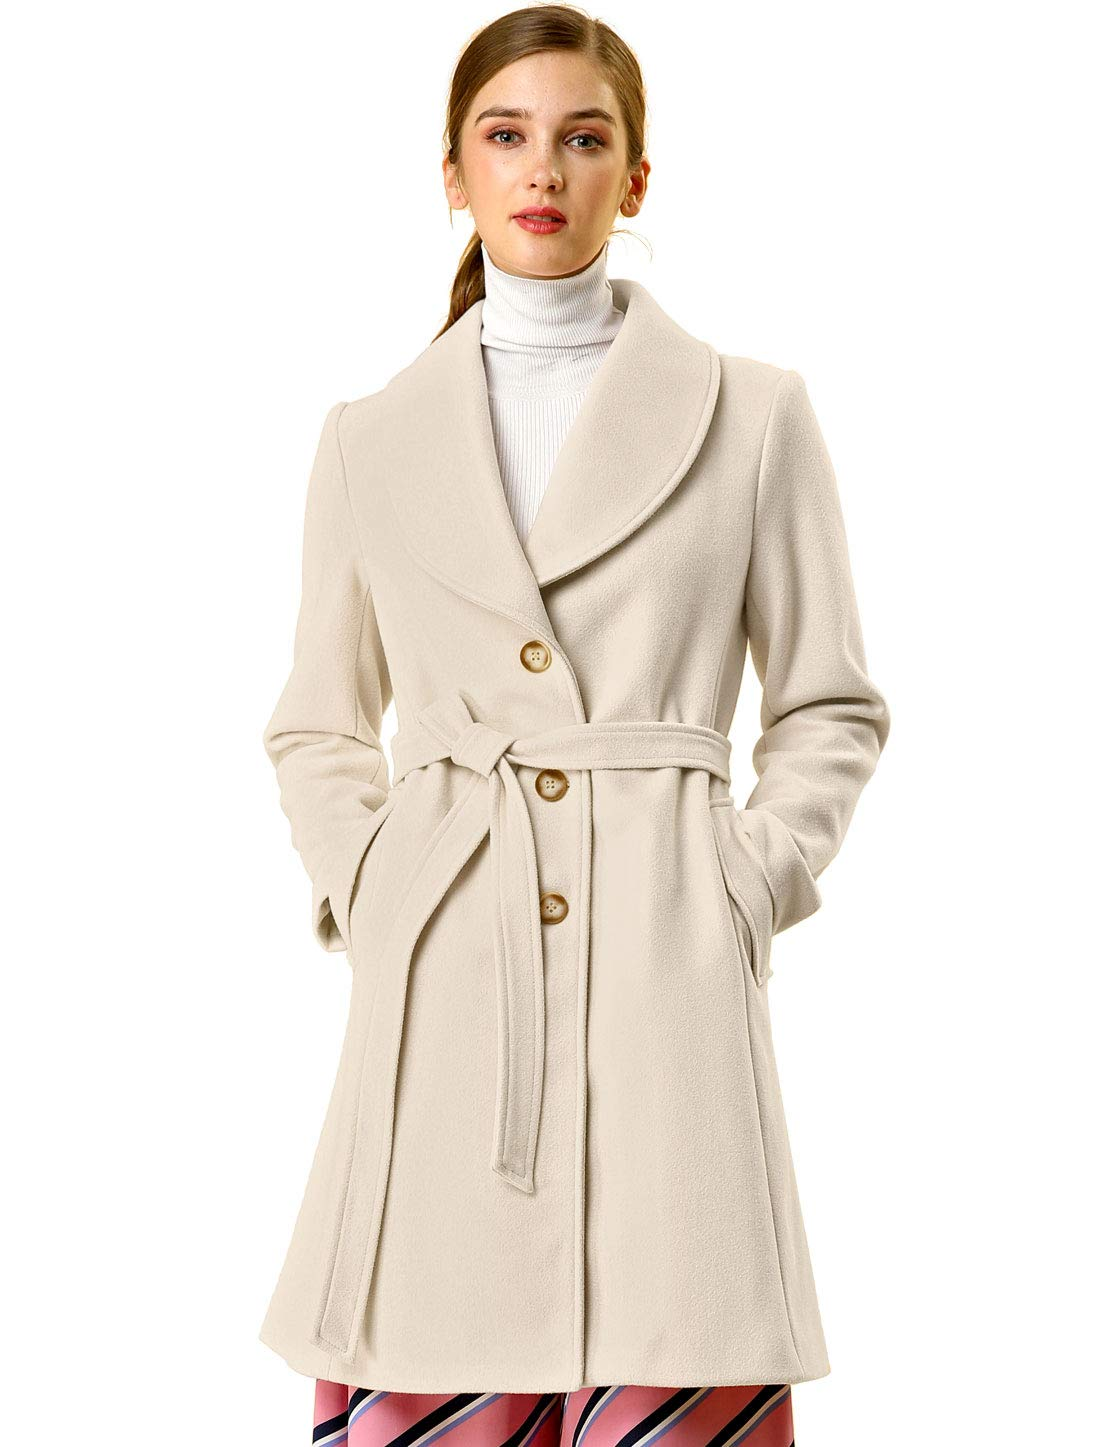 Allegra K Women's Shawl Collar Single Breasted Winter Long Belted Coat